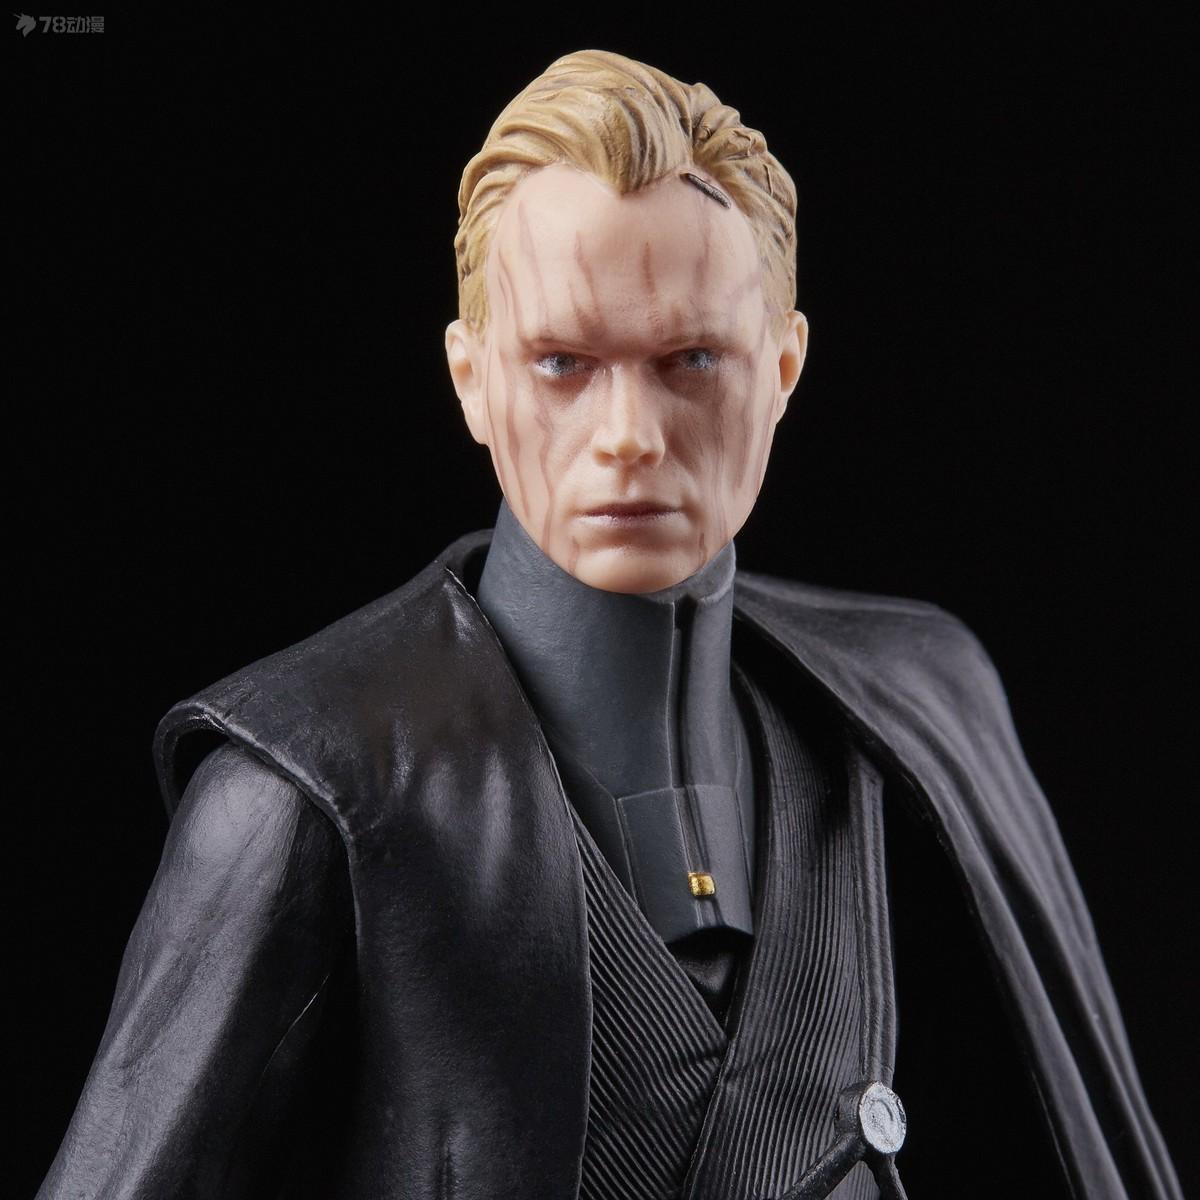 E4070_Star_Wars_The_Black_Series_Dryden_Vos_Figure_4_2000x.jpg